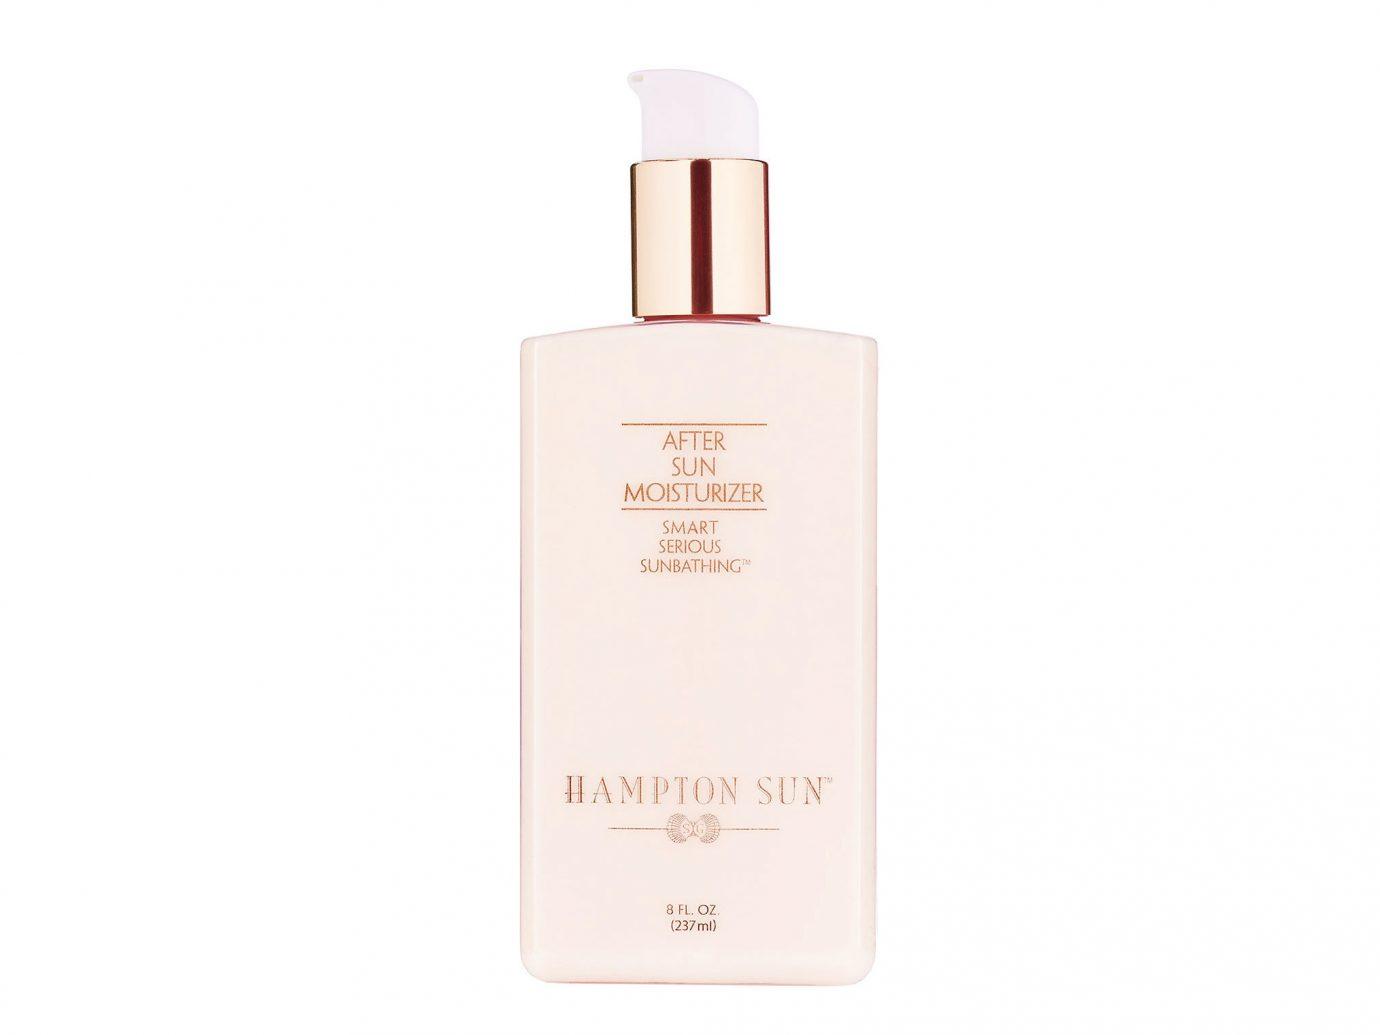 Beauty toiletry lotion perfume skin product hand cosmetics skin care